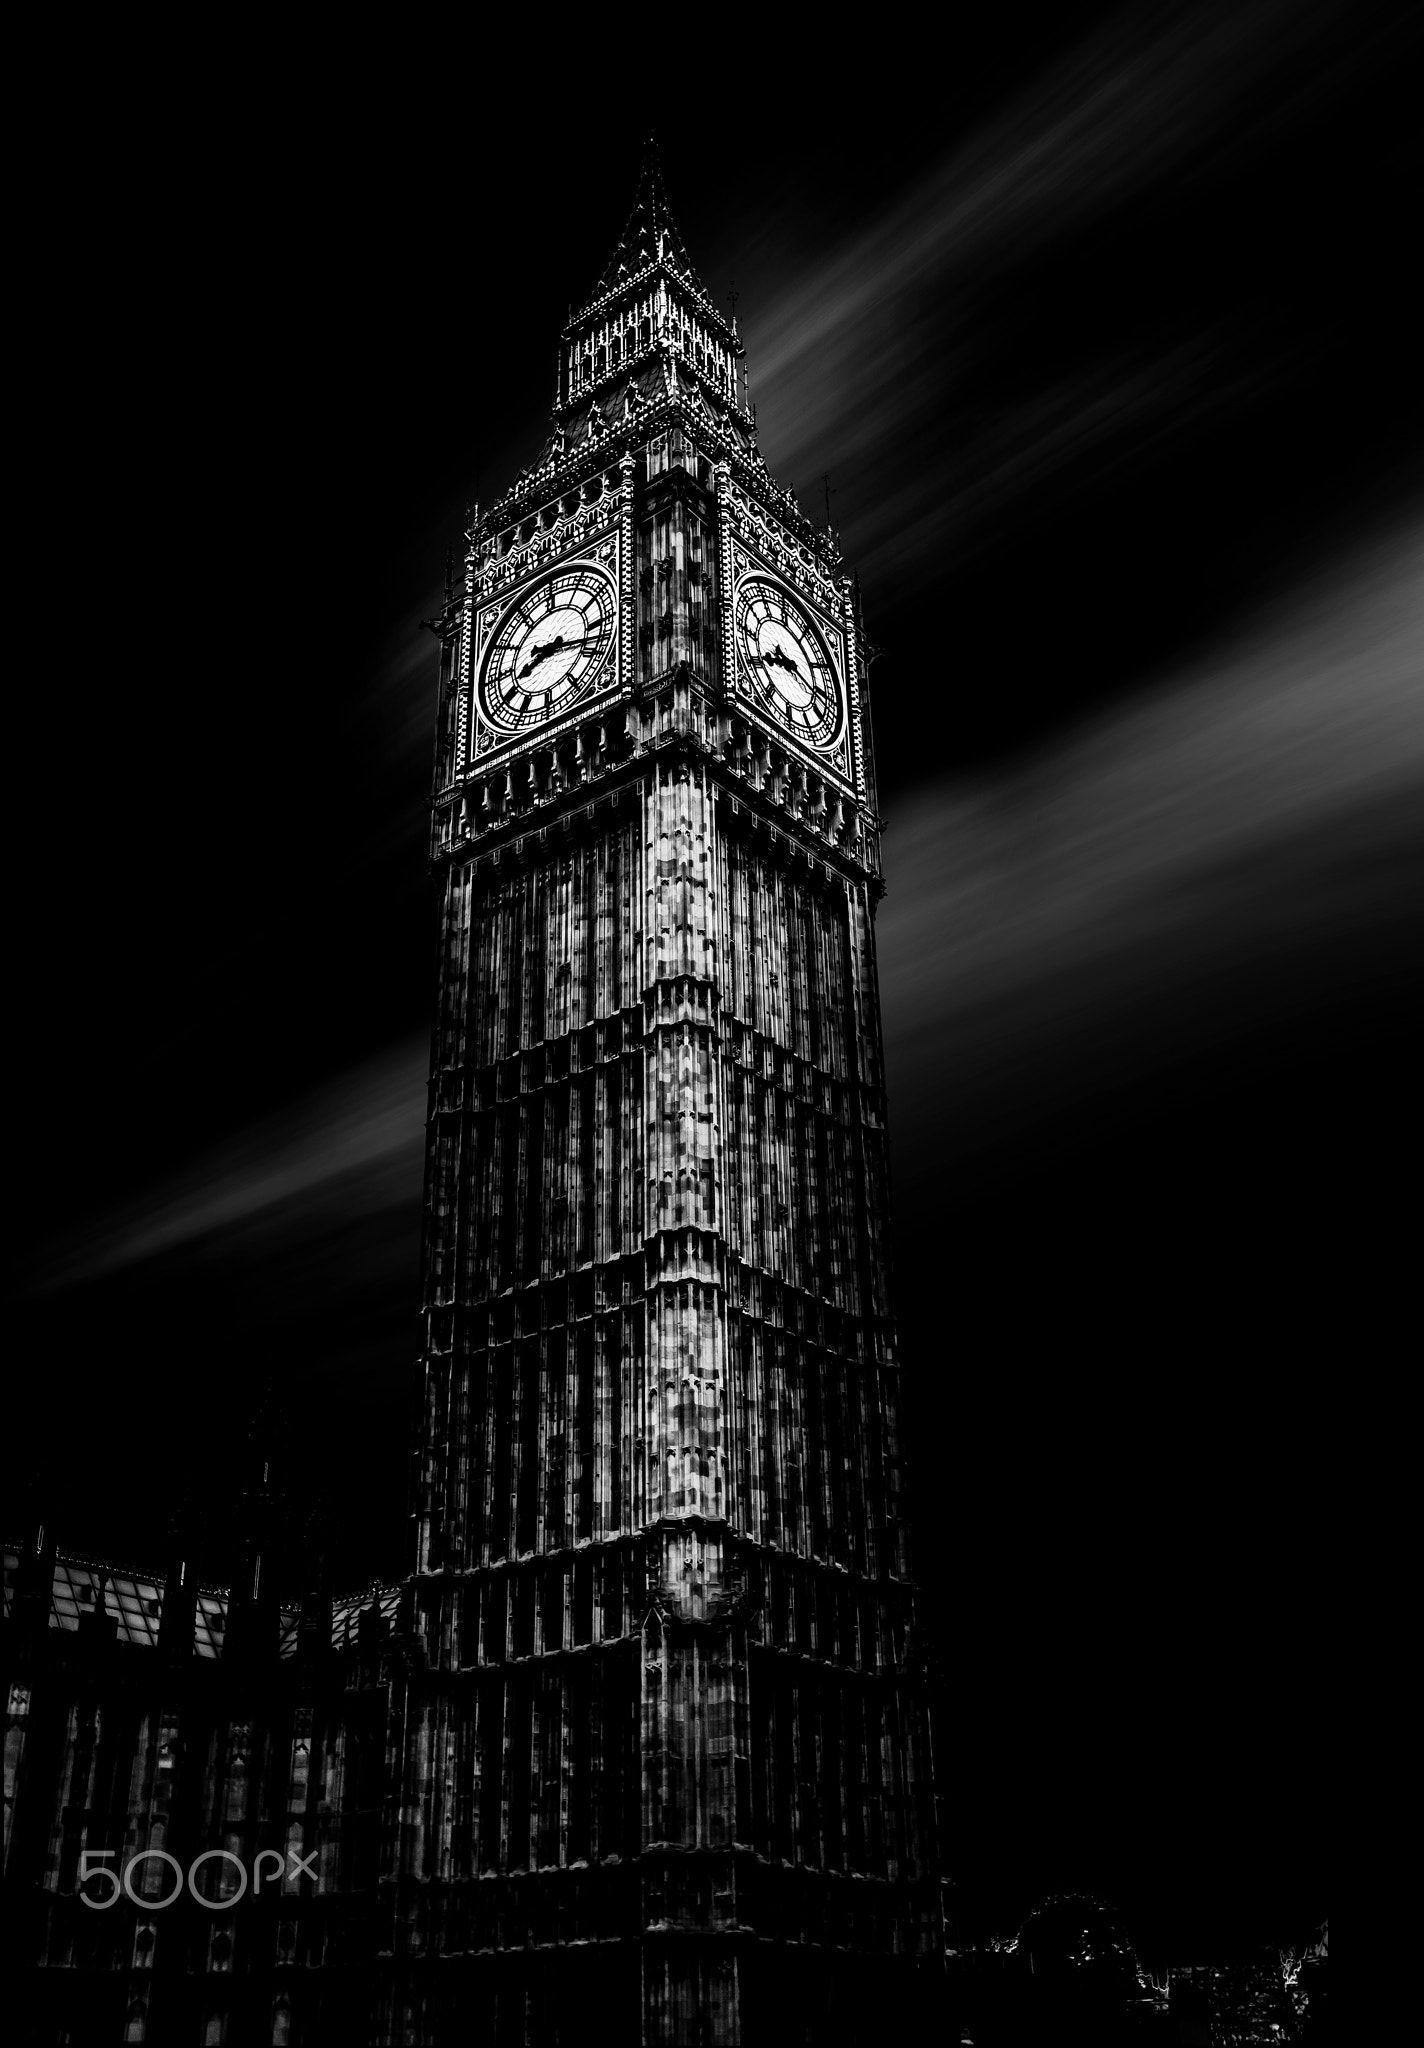 Old London - Big Ben London - City of Westminster, UK Photo: Jackson Carvalho www.artedigitalstudio.com..br 2016, All Rights Reserved better viewed in black background